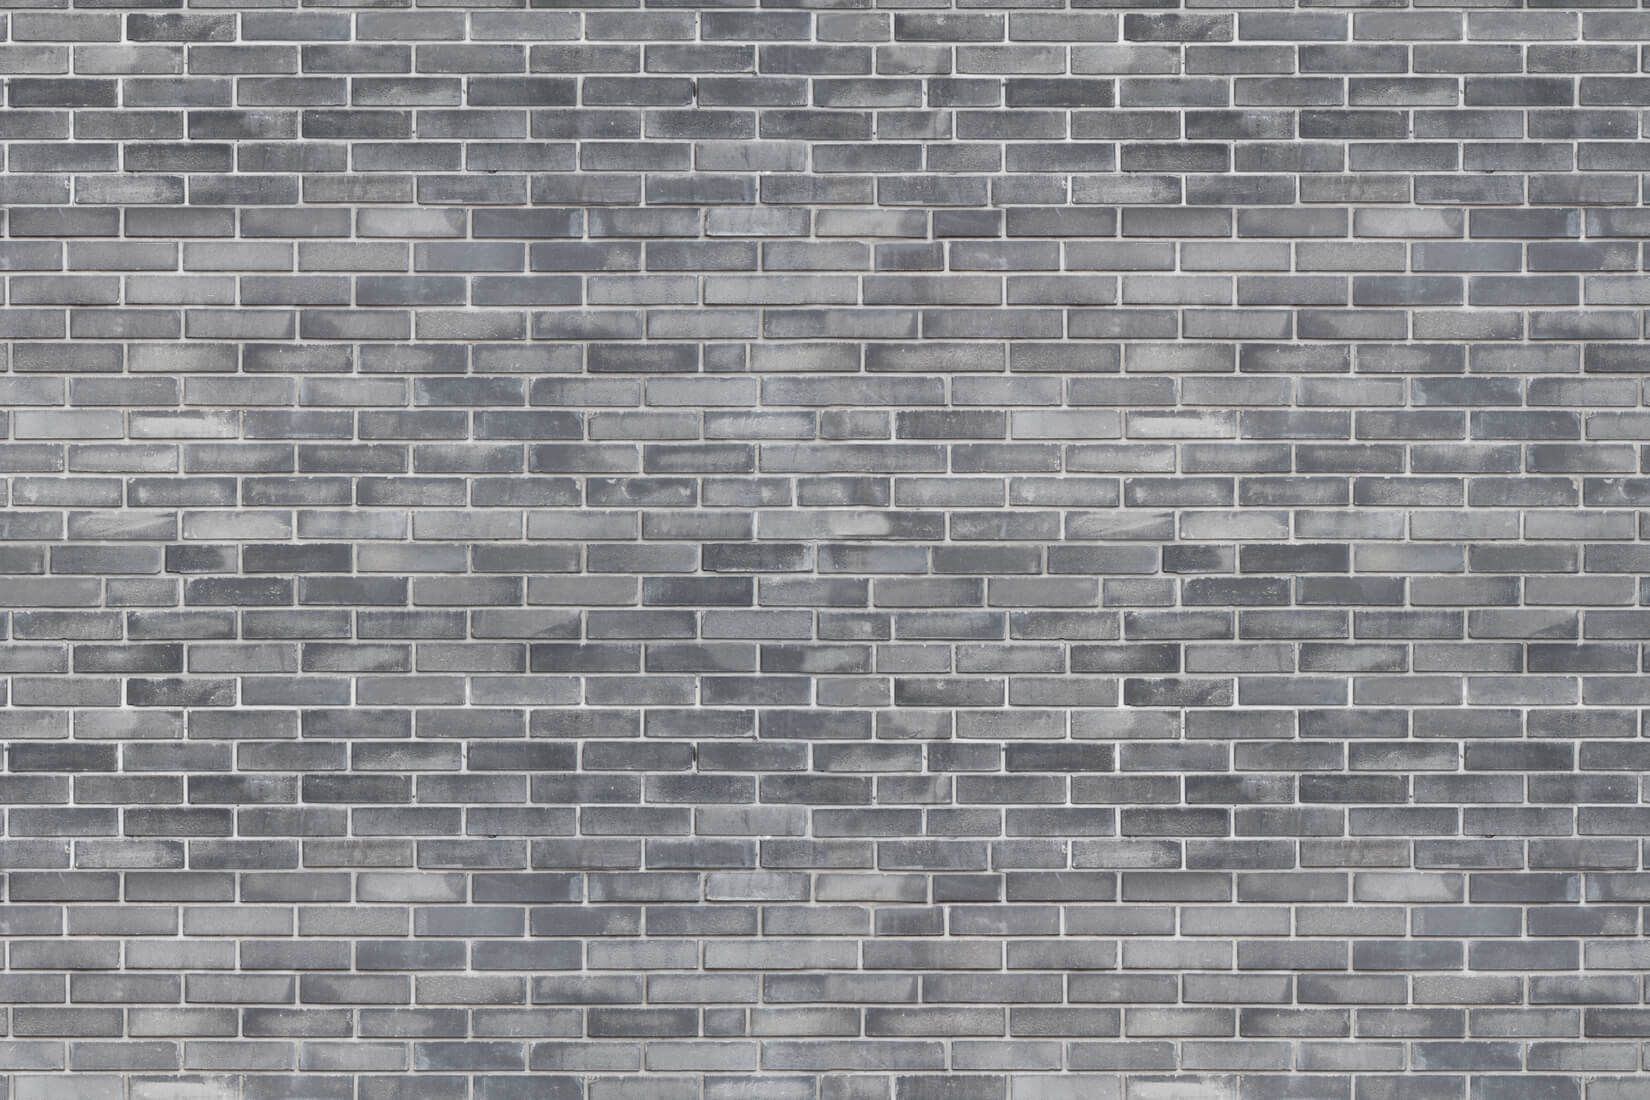 Grey Brick Wallpaper Mural Grey Brick Brick Wallpaper Brick Wallpaper Mural